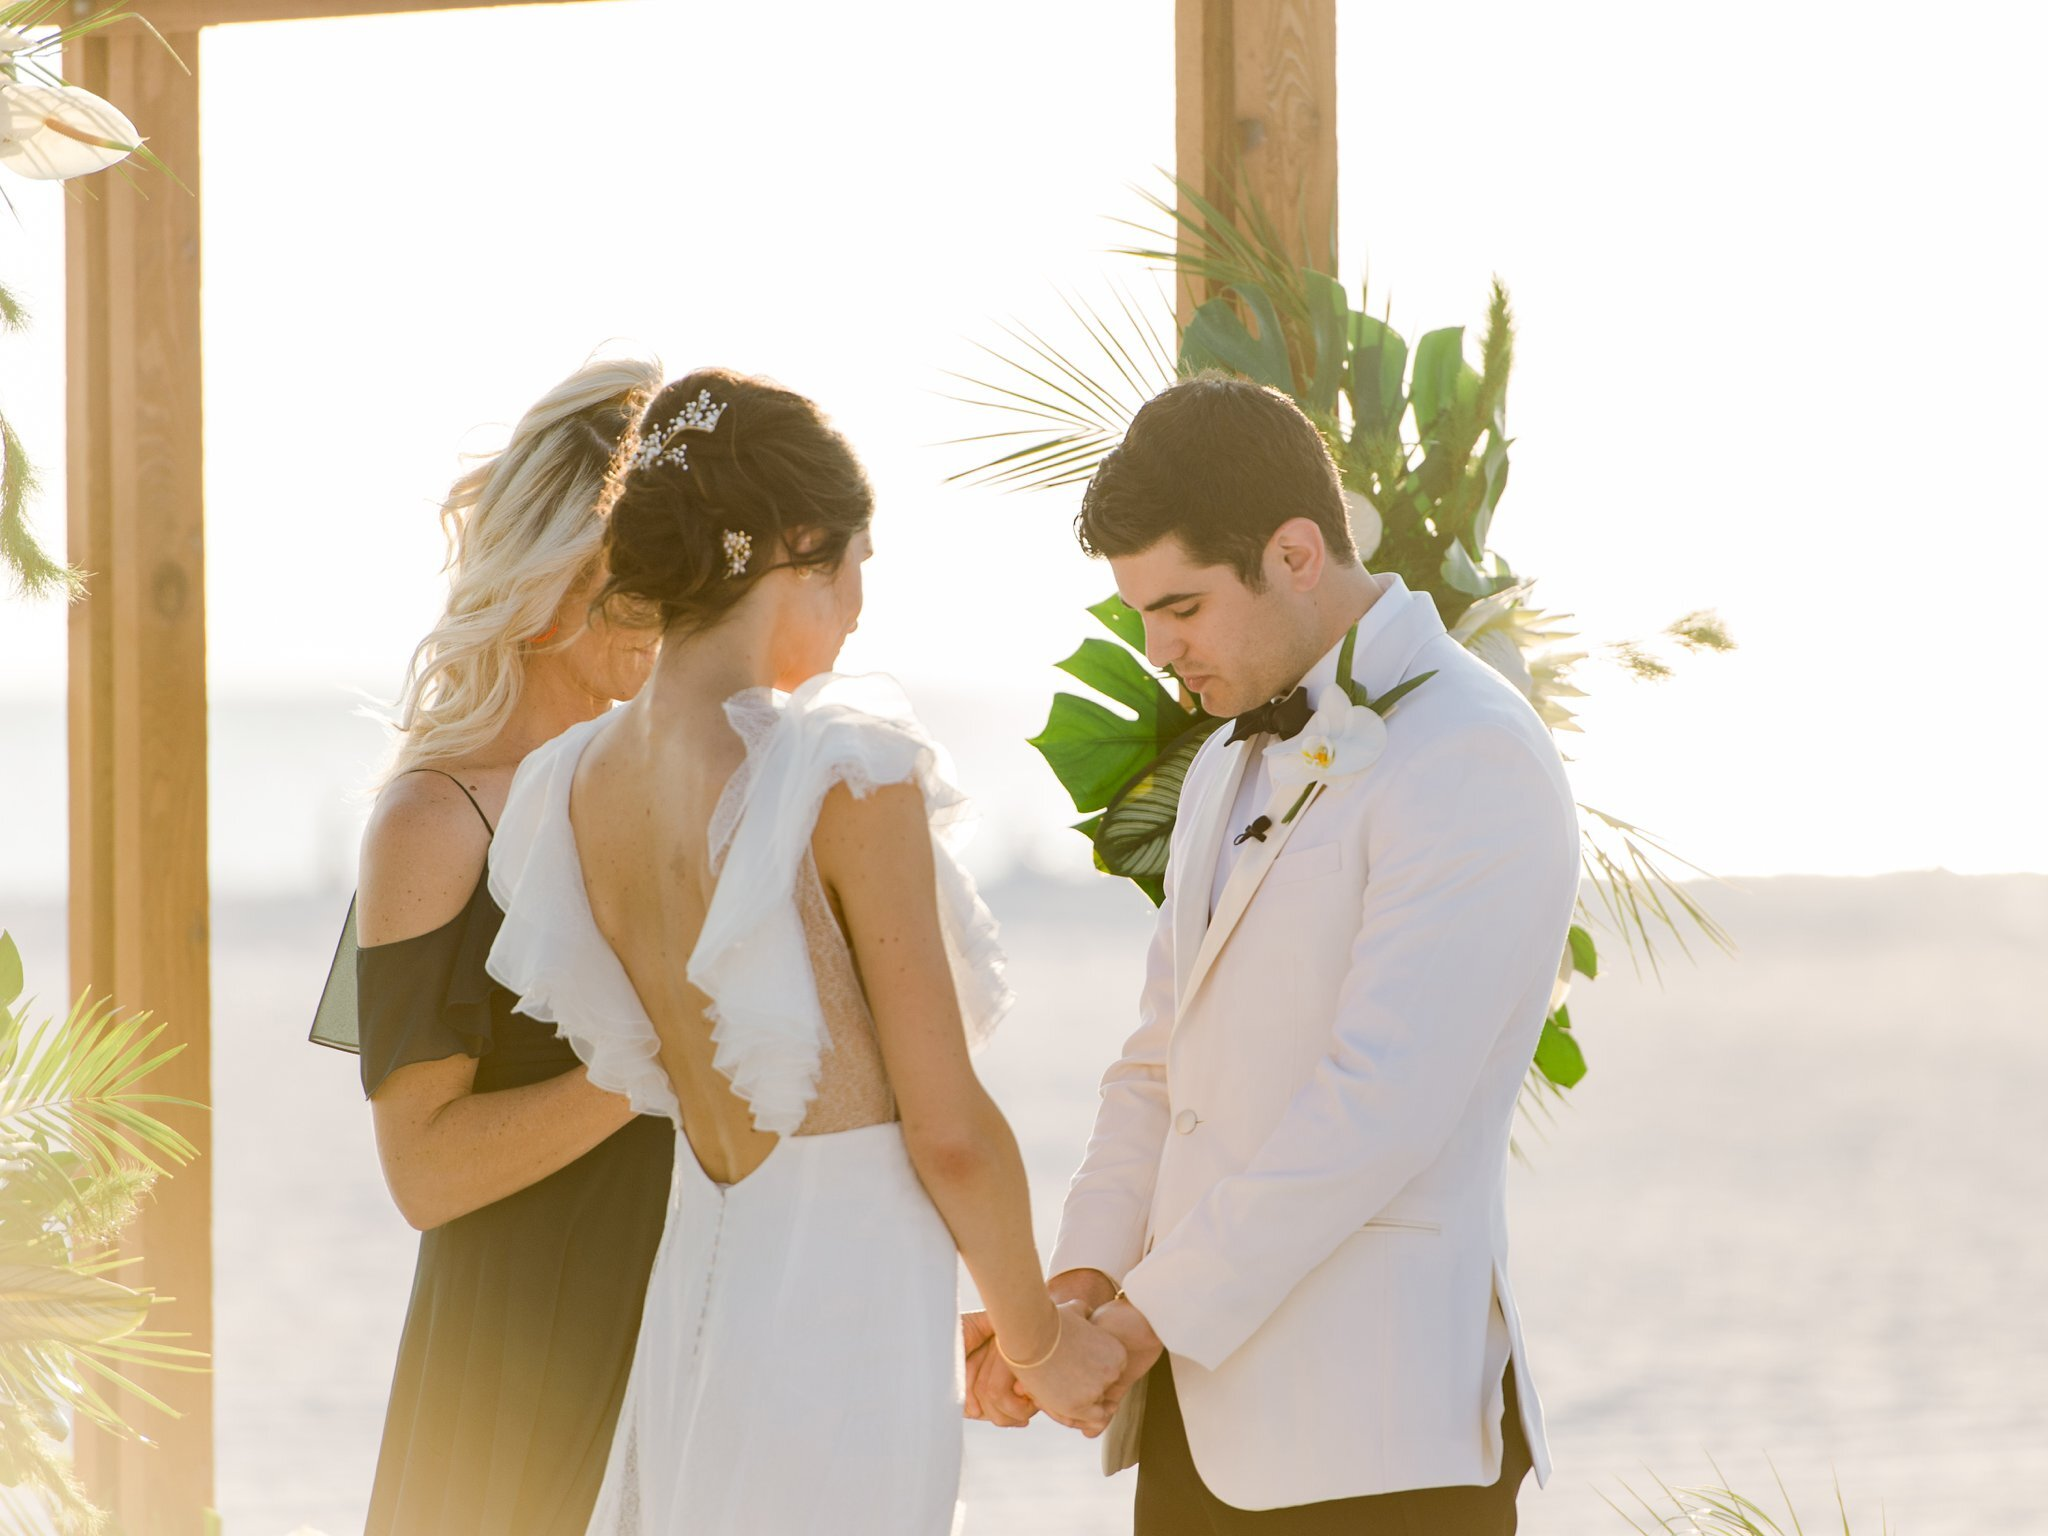 jw marriott marco island wedding photographer marco island wedding photographer shannon griffin photography_0181.jpg